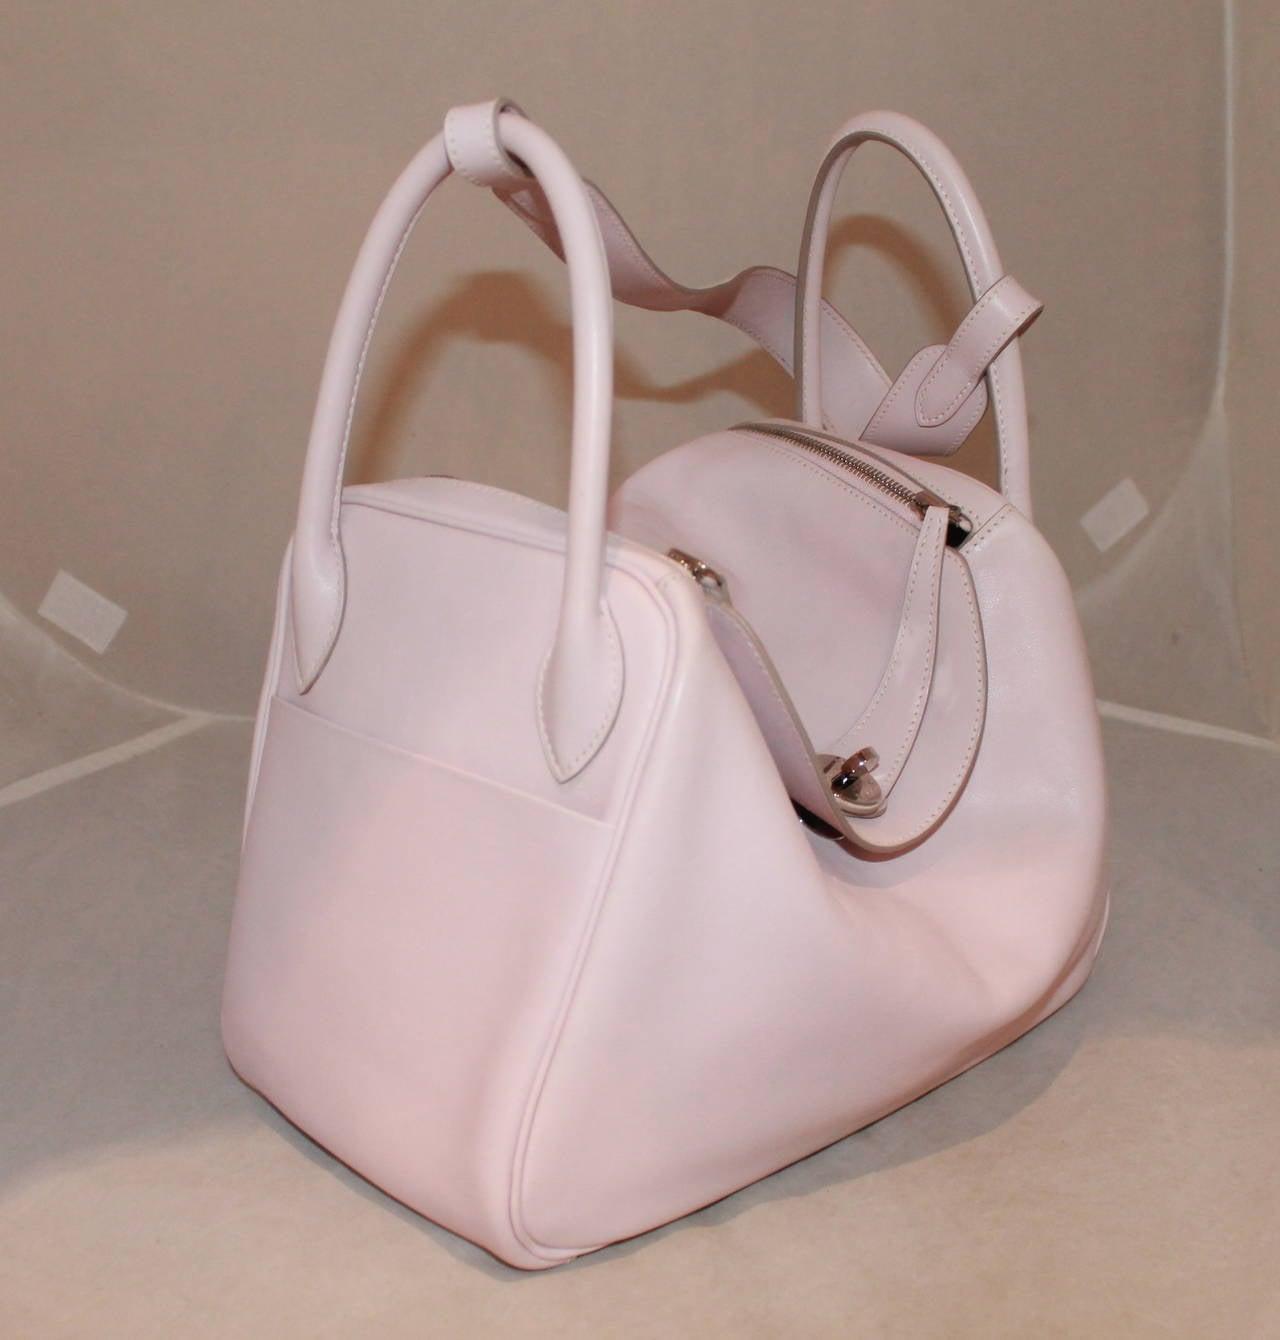 Hermes Rose Dragee 30cm Lindy Veau Swift Handbag - circa 2007 2